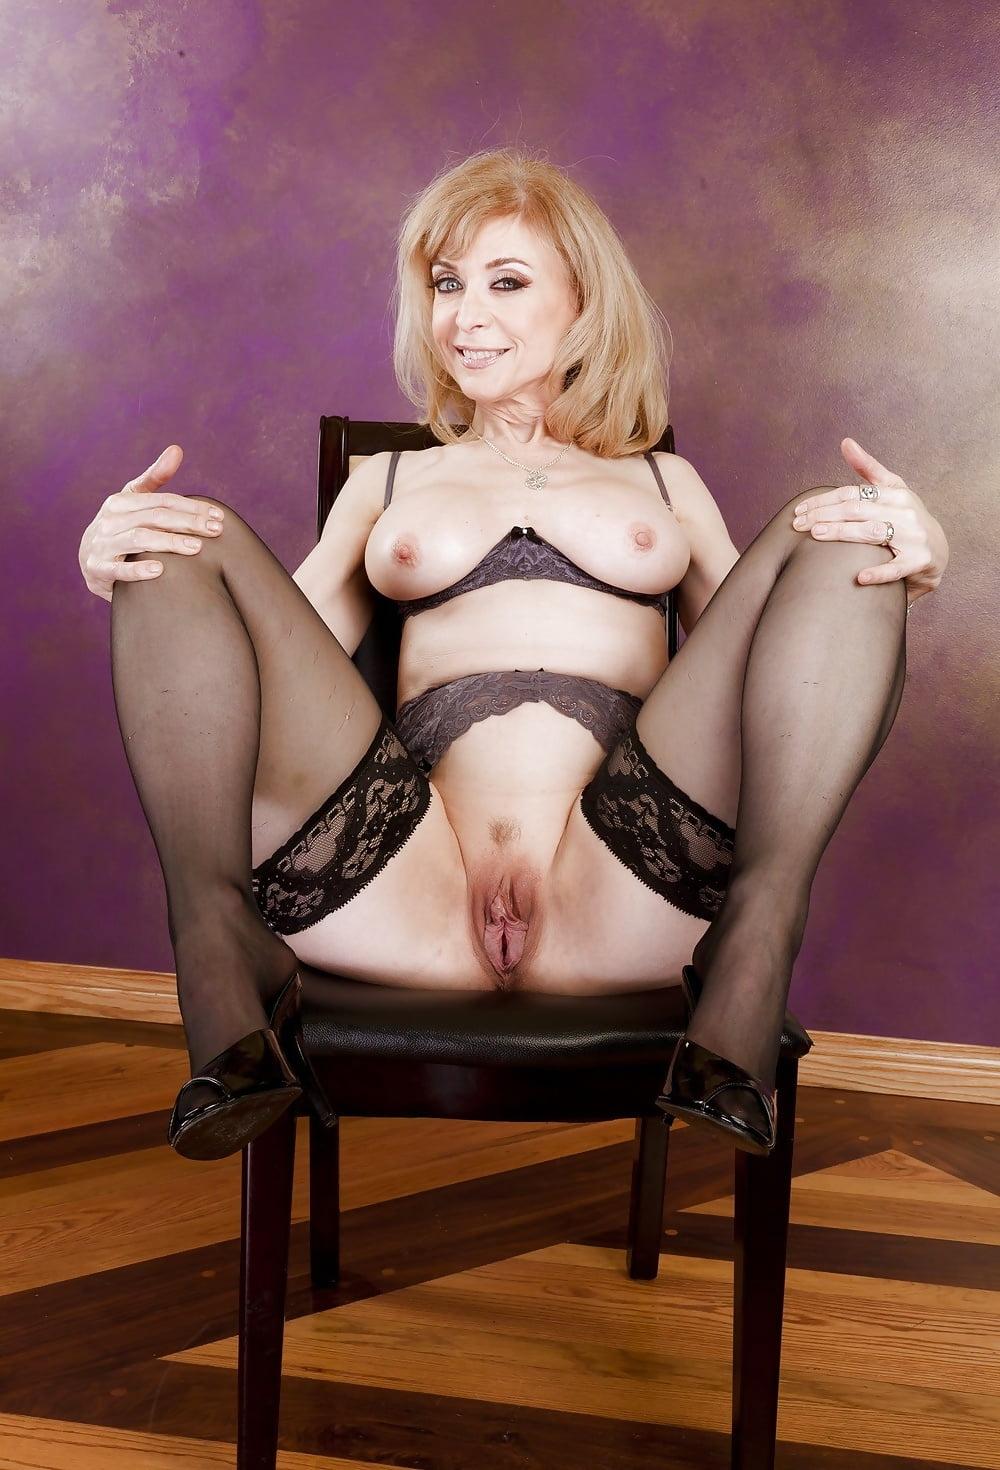 Nina hartley spread ass